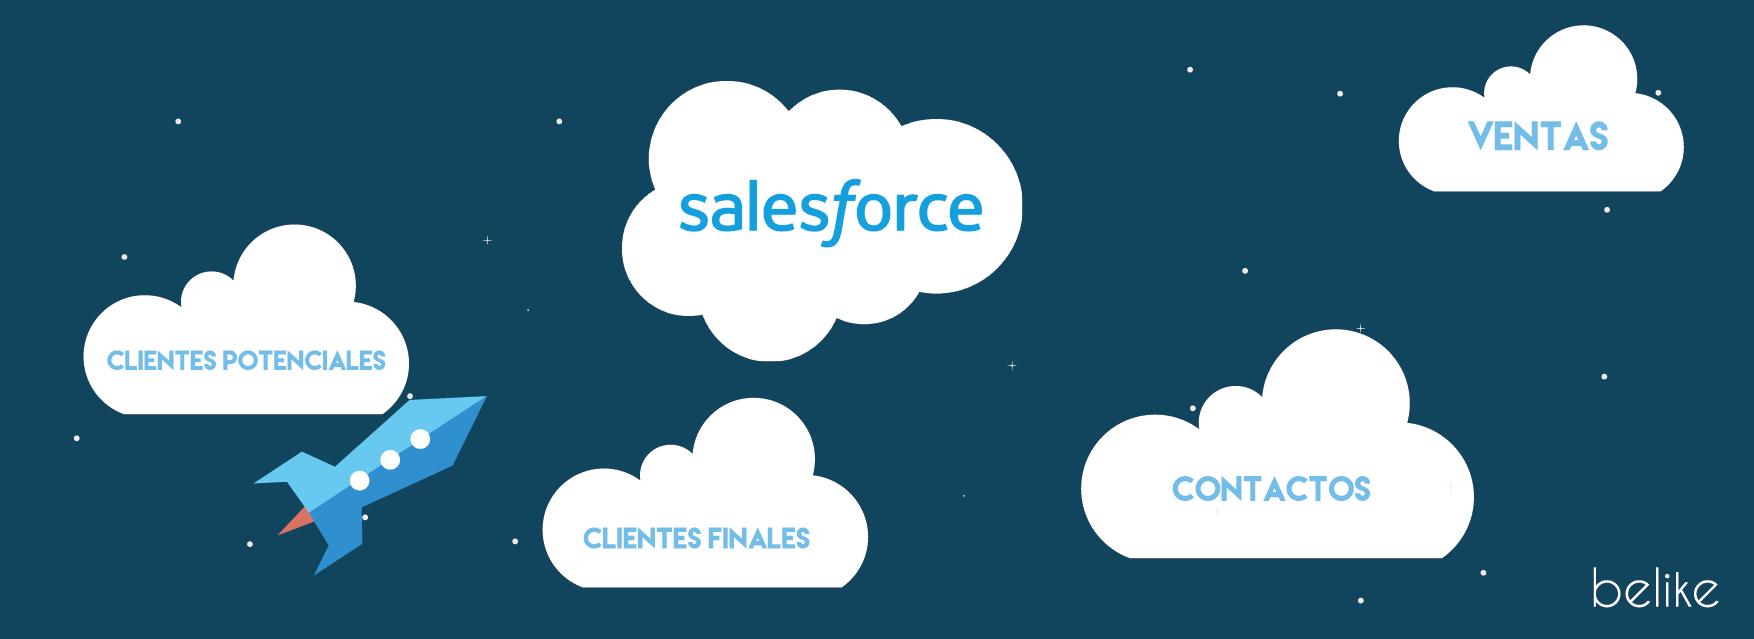 Salesforce integracion